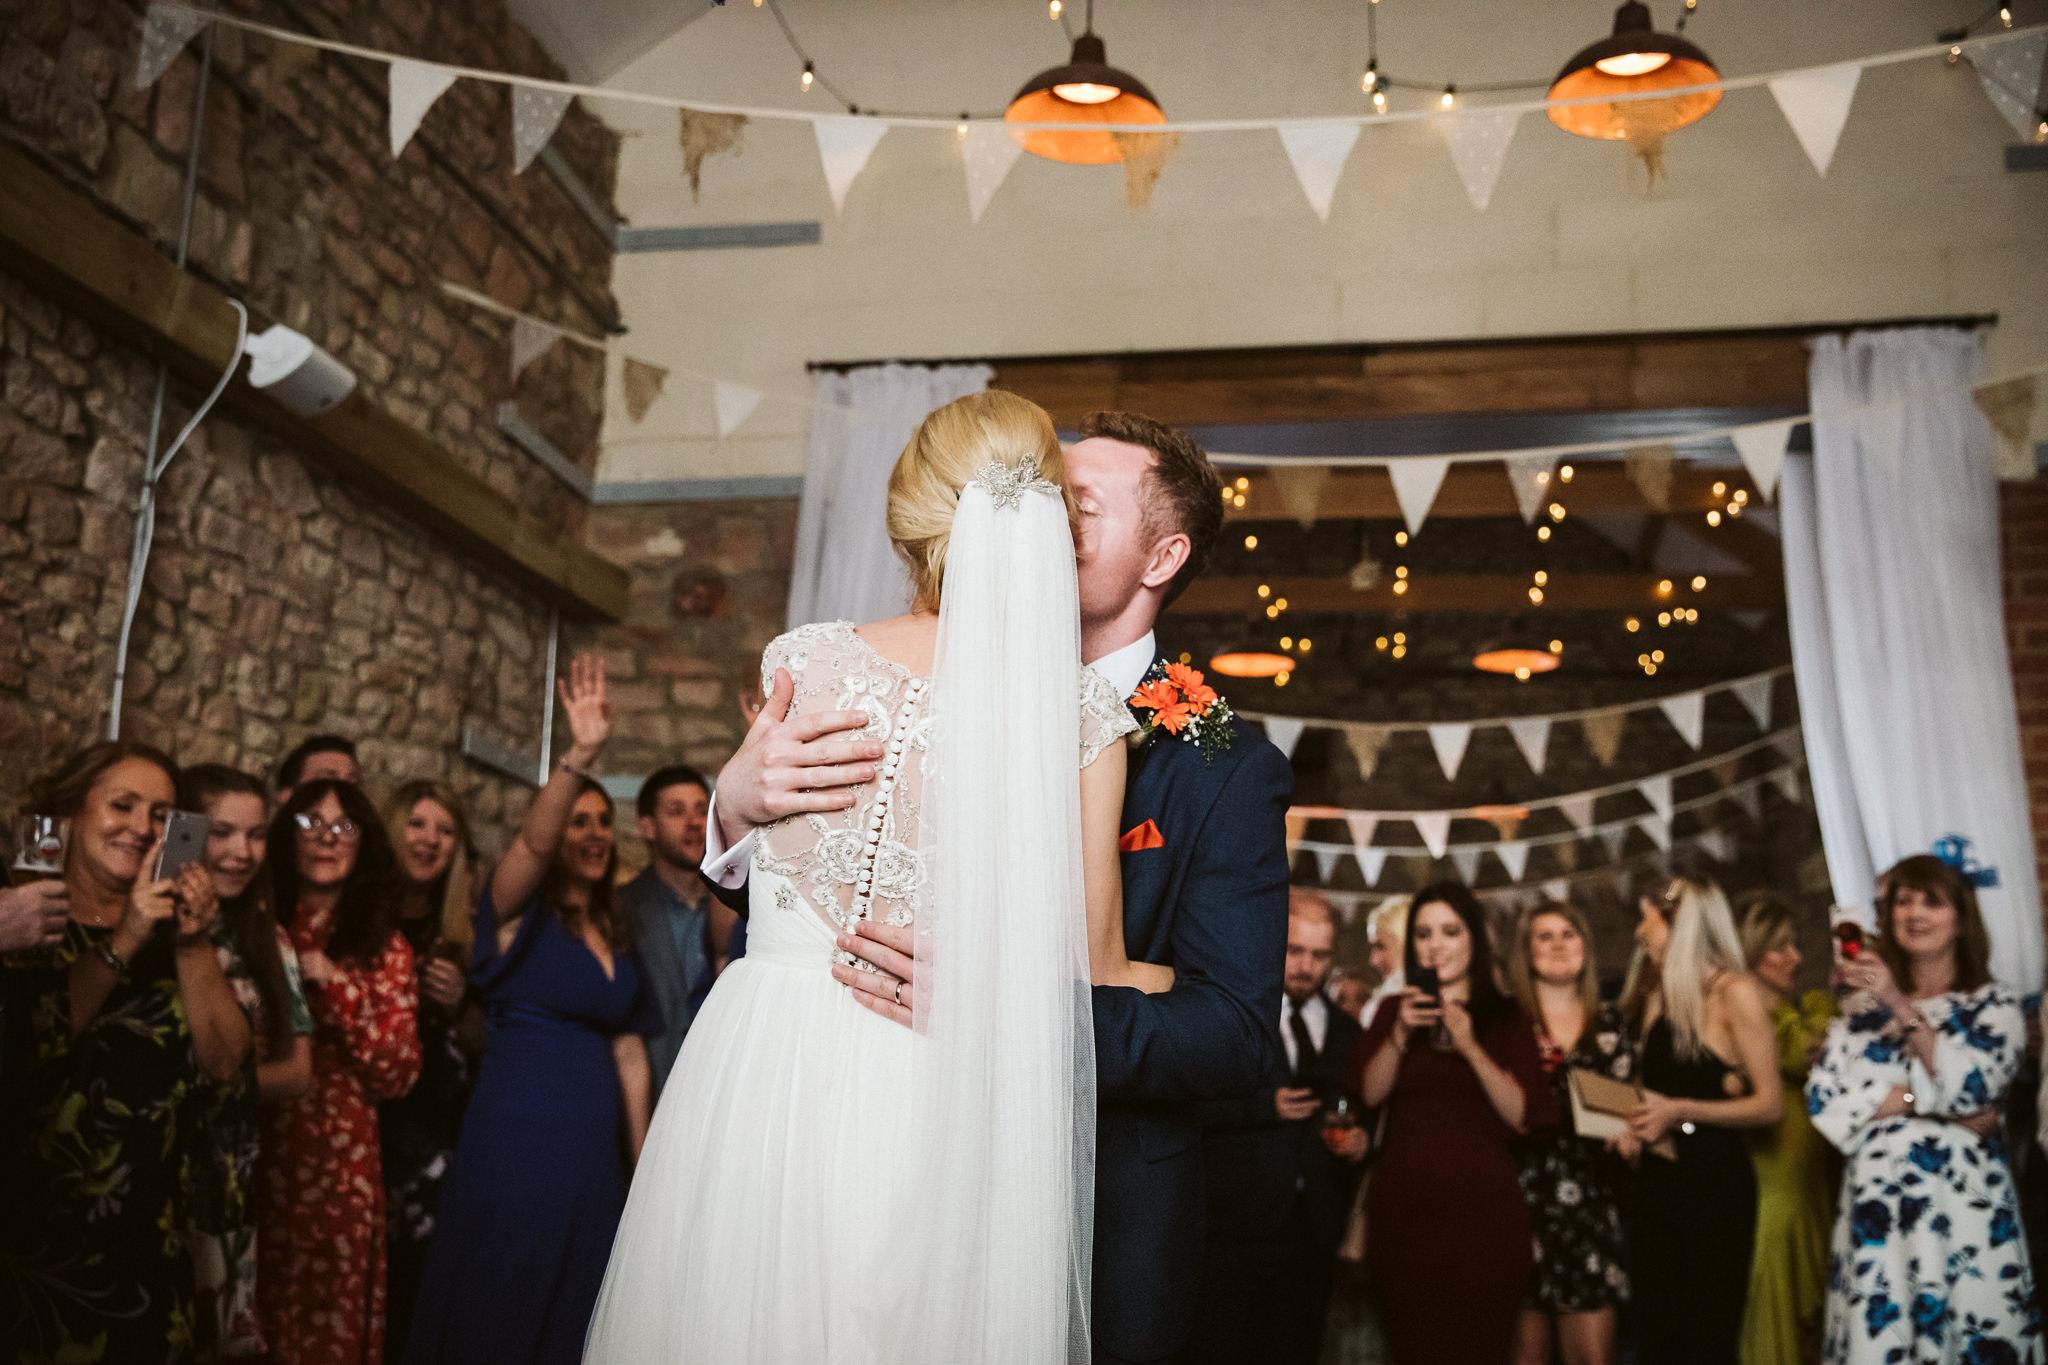 northside-farm-wedding-northumberland-margarita-hope (130).jpg